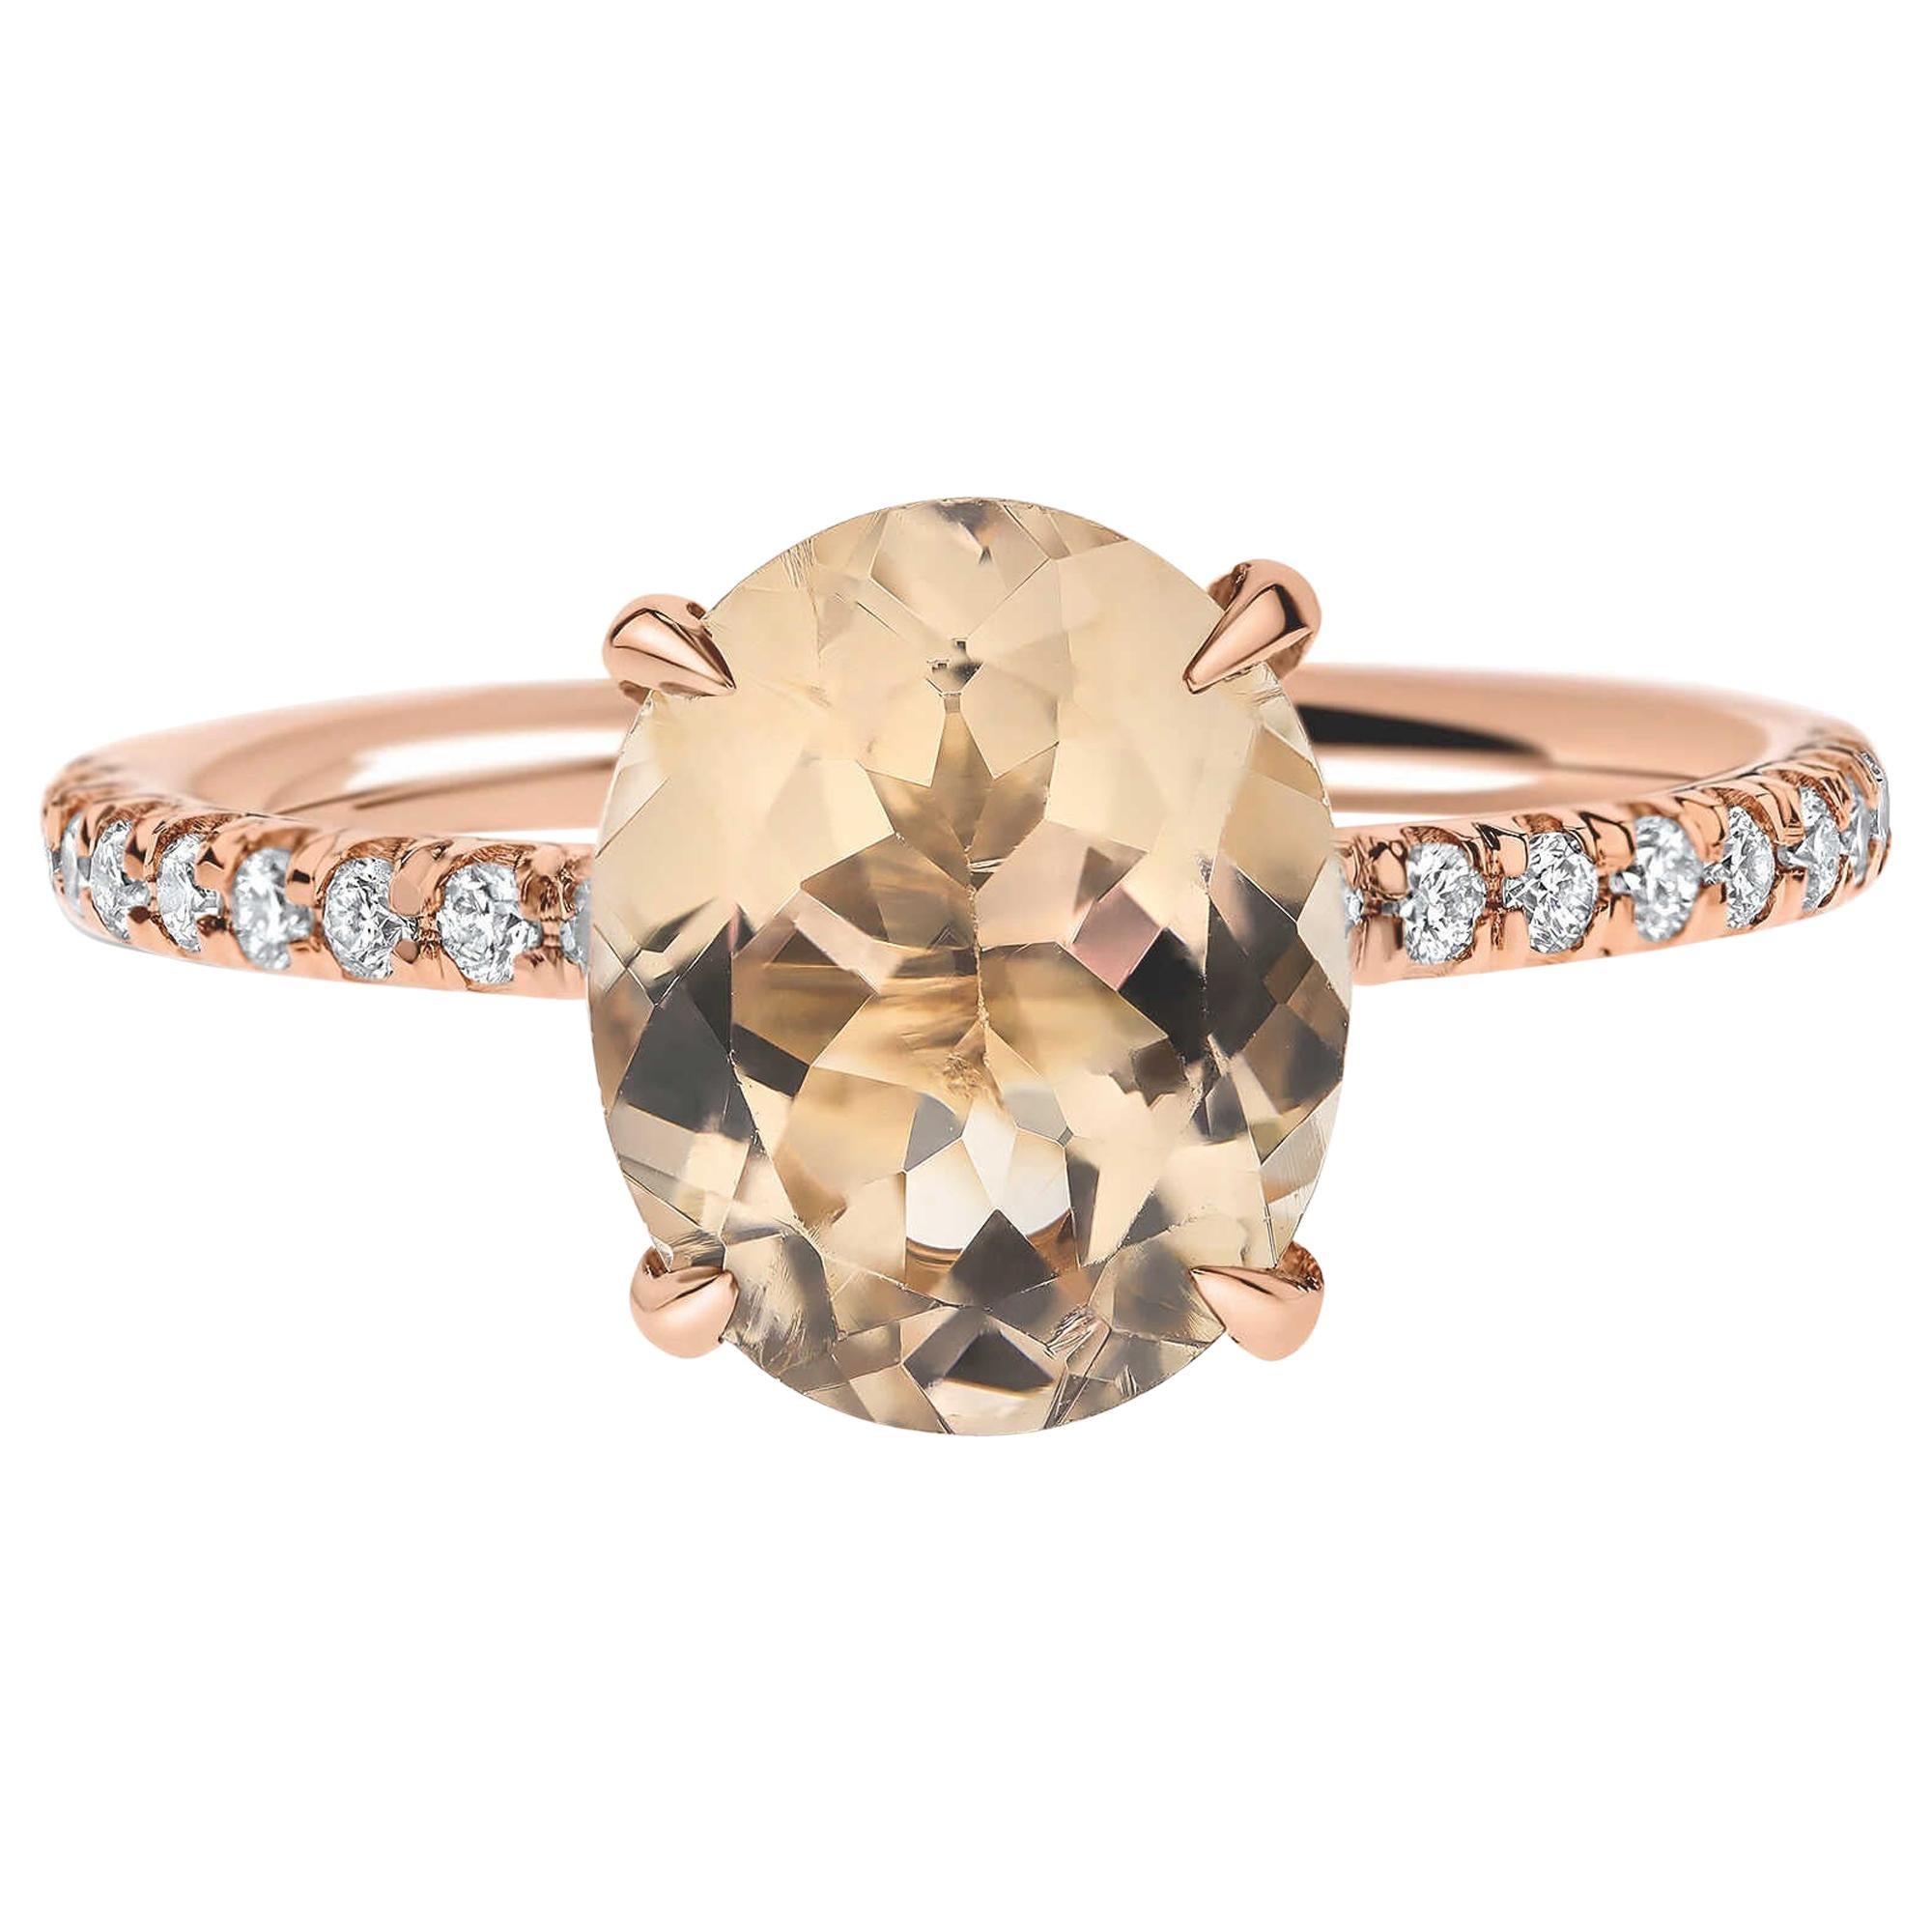 2.1 Carat Oval Morganite and Diamonds Designer Ring in 14 Karat Rose Gold